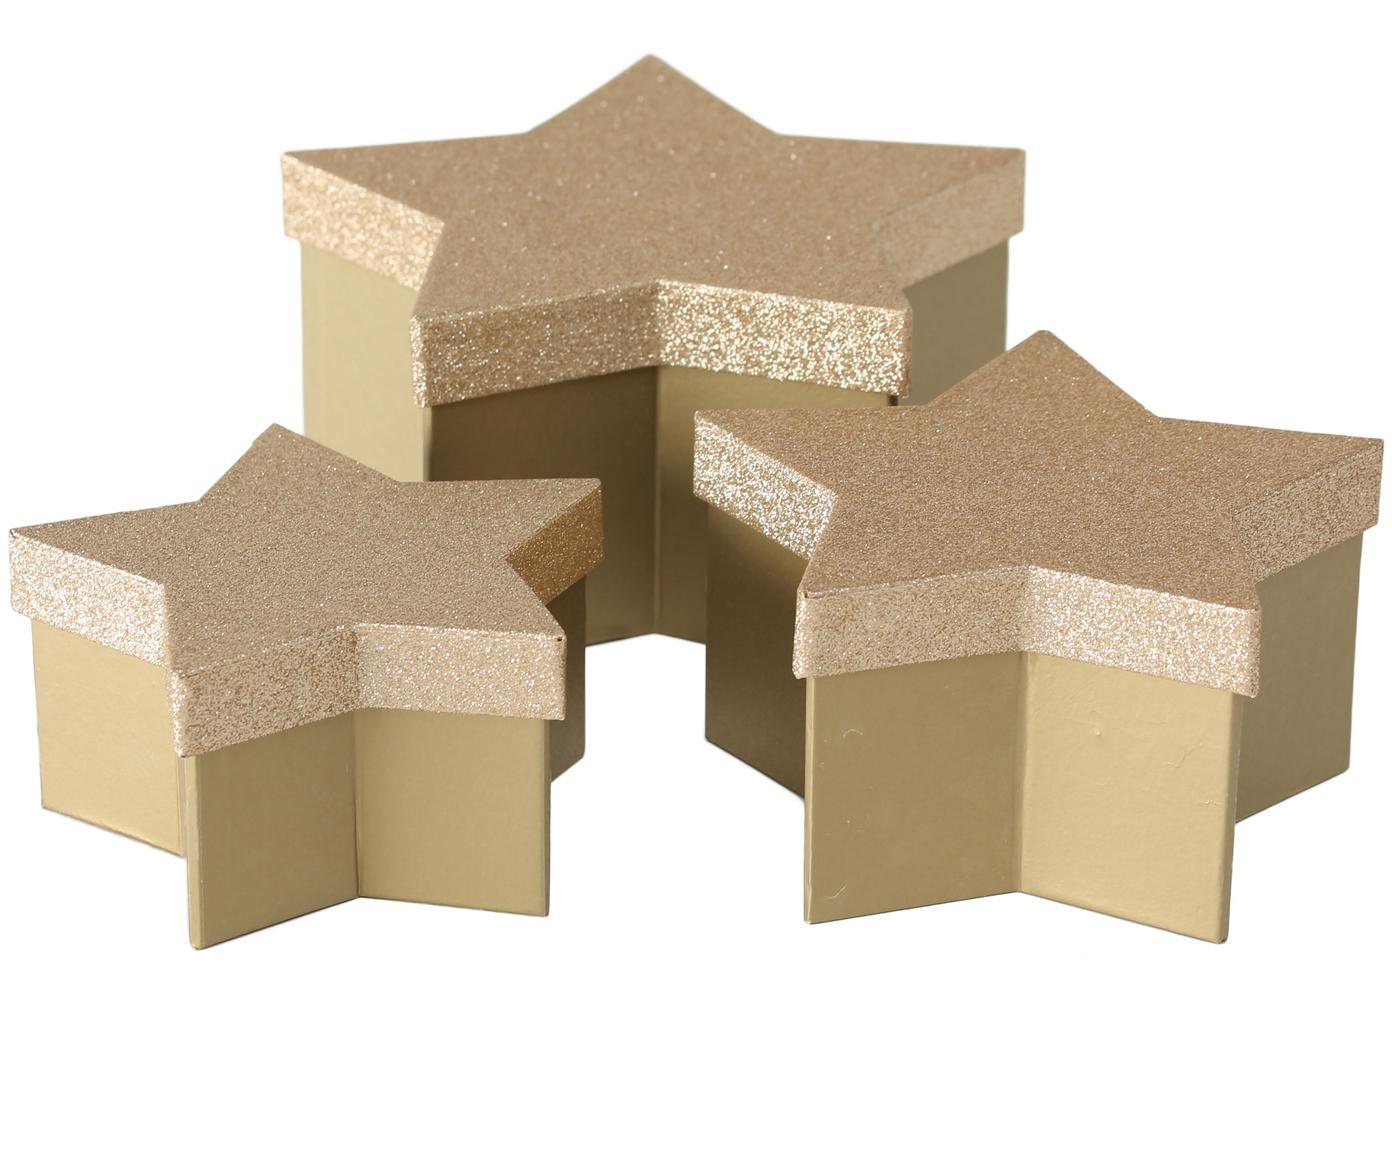 Set de cajas para regalo Star, 3pzas., Papel, Dorado, Tamaños diferentes